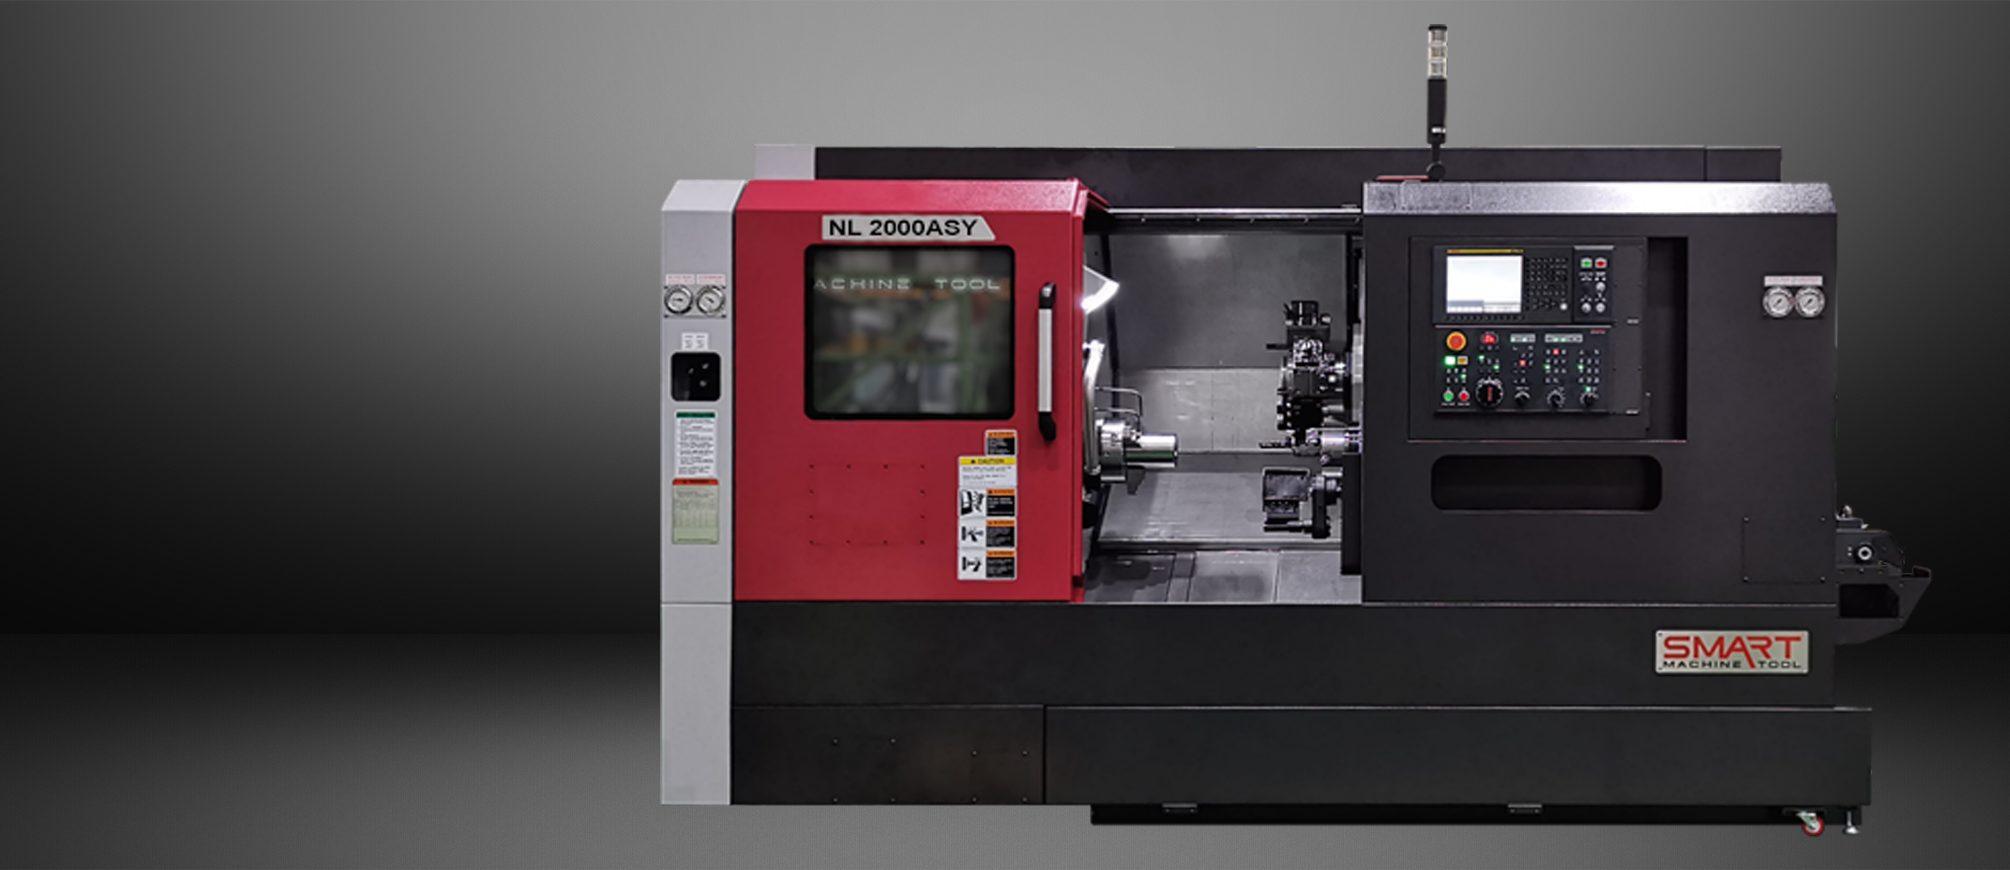 SMART NL 2000ASY – BOX WAY – (6″ CHUCK) Multi-Axis CNC Lathes